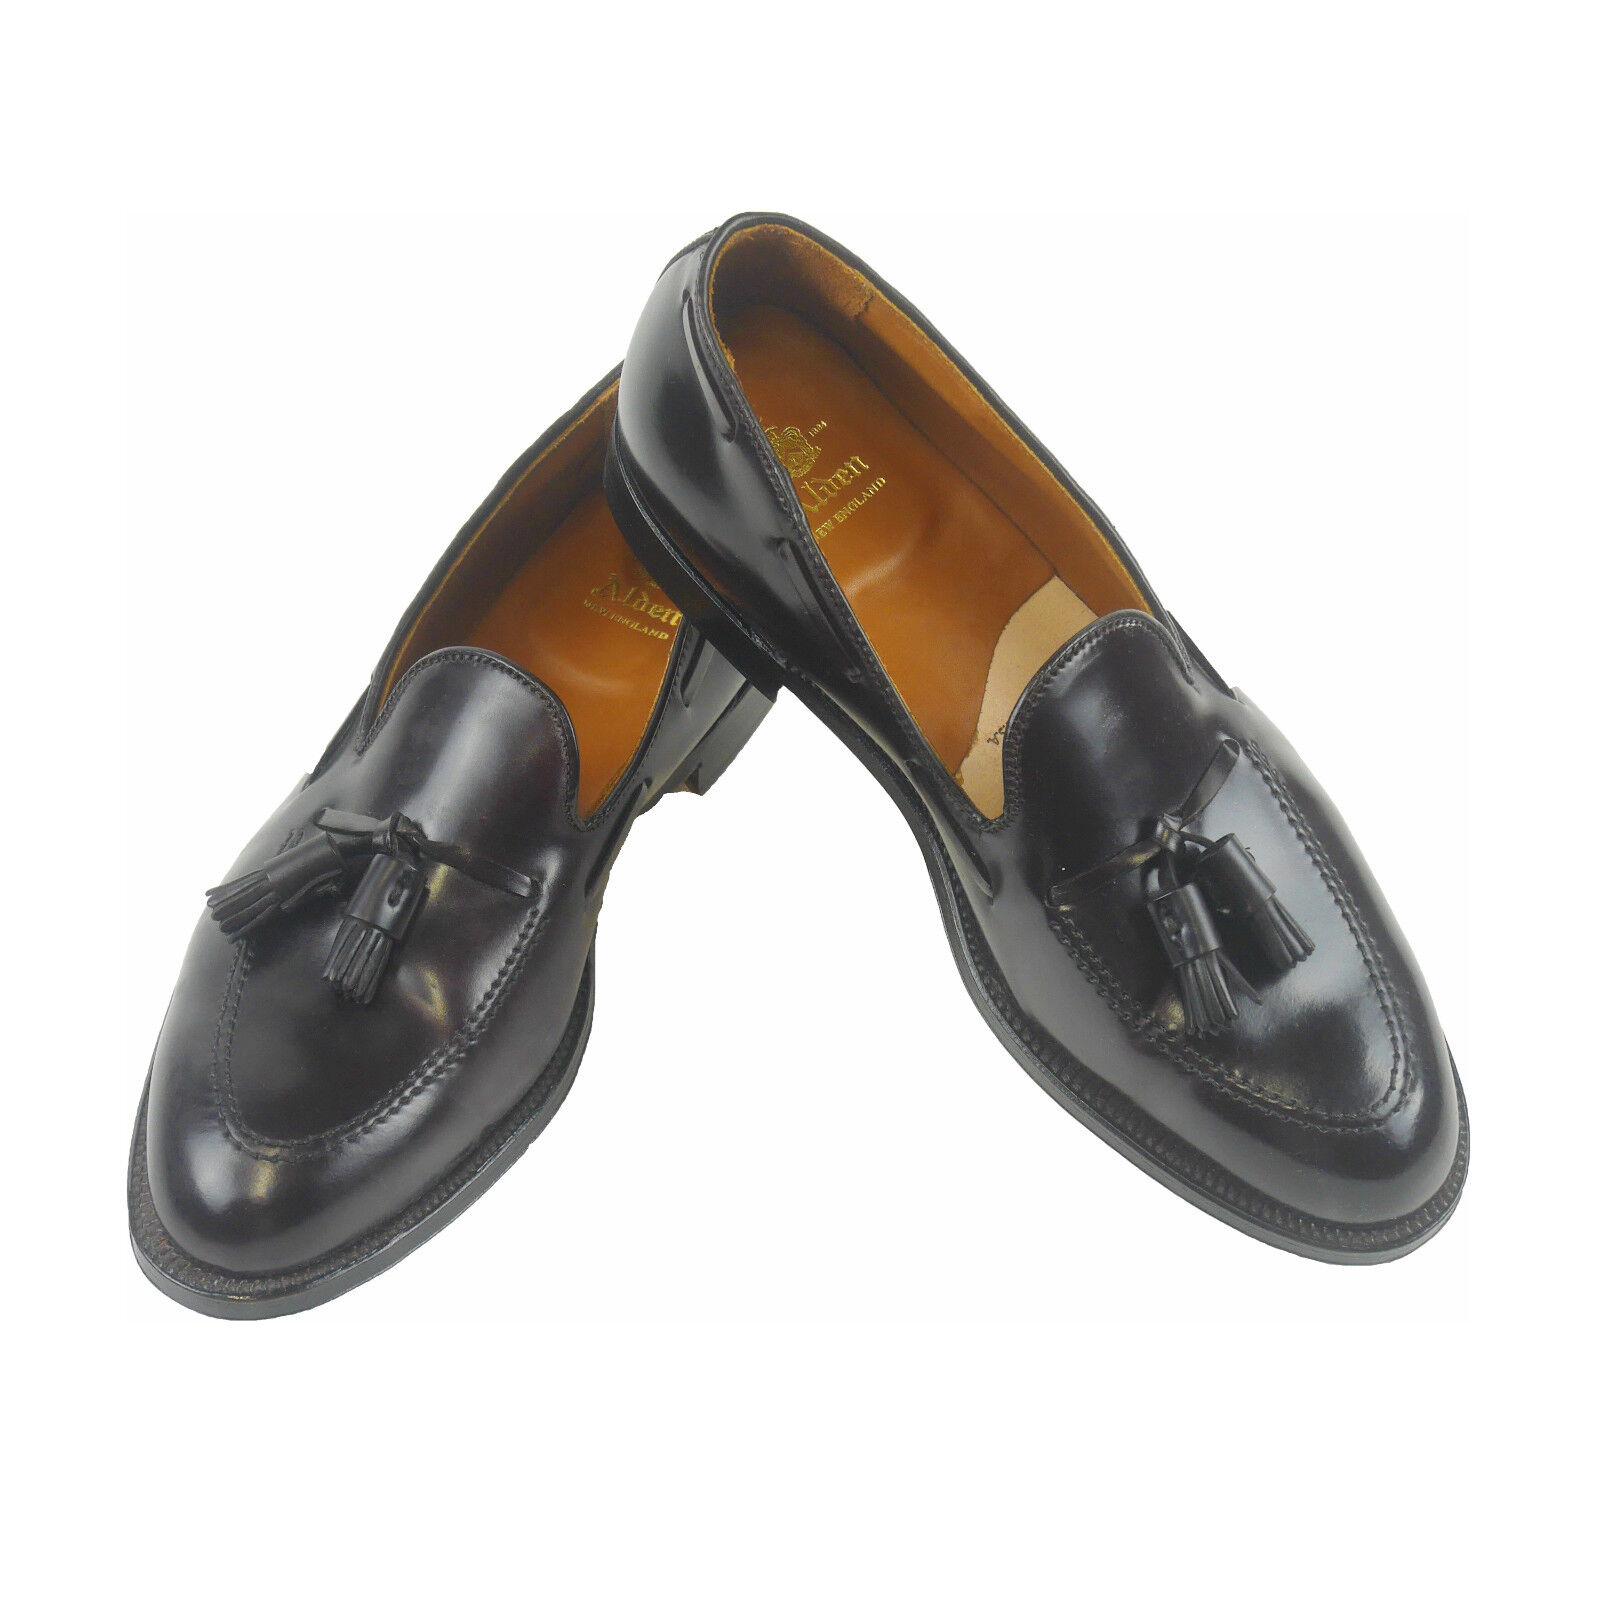 Alden Men's shoes   Tassel   Horse Leather Burgundi Us Size 11d (Previously